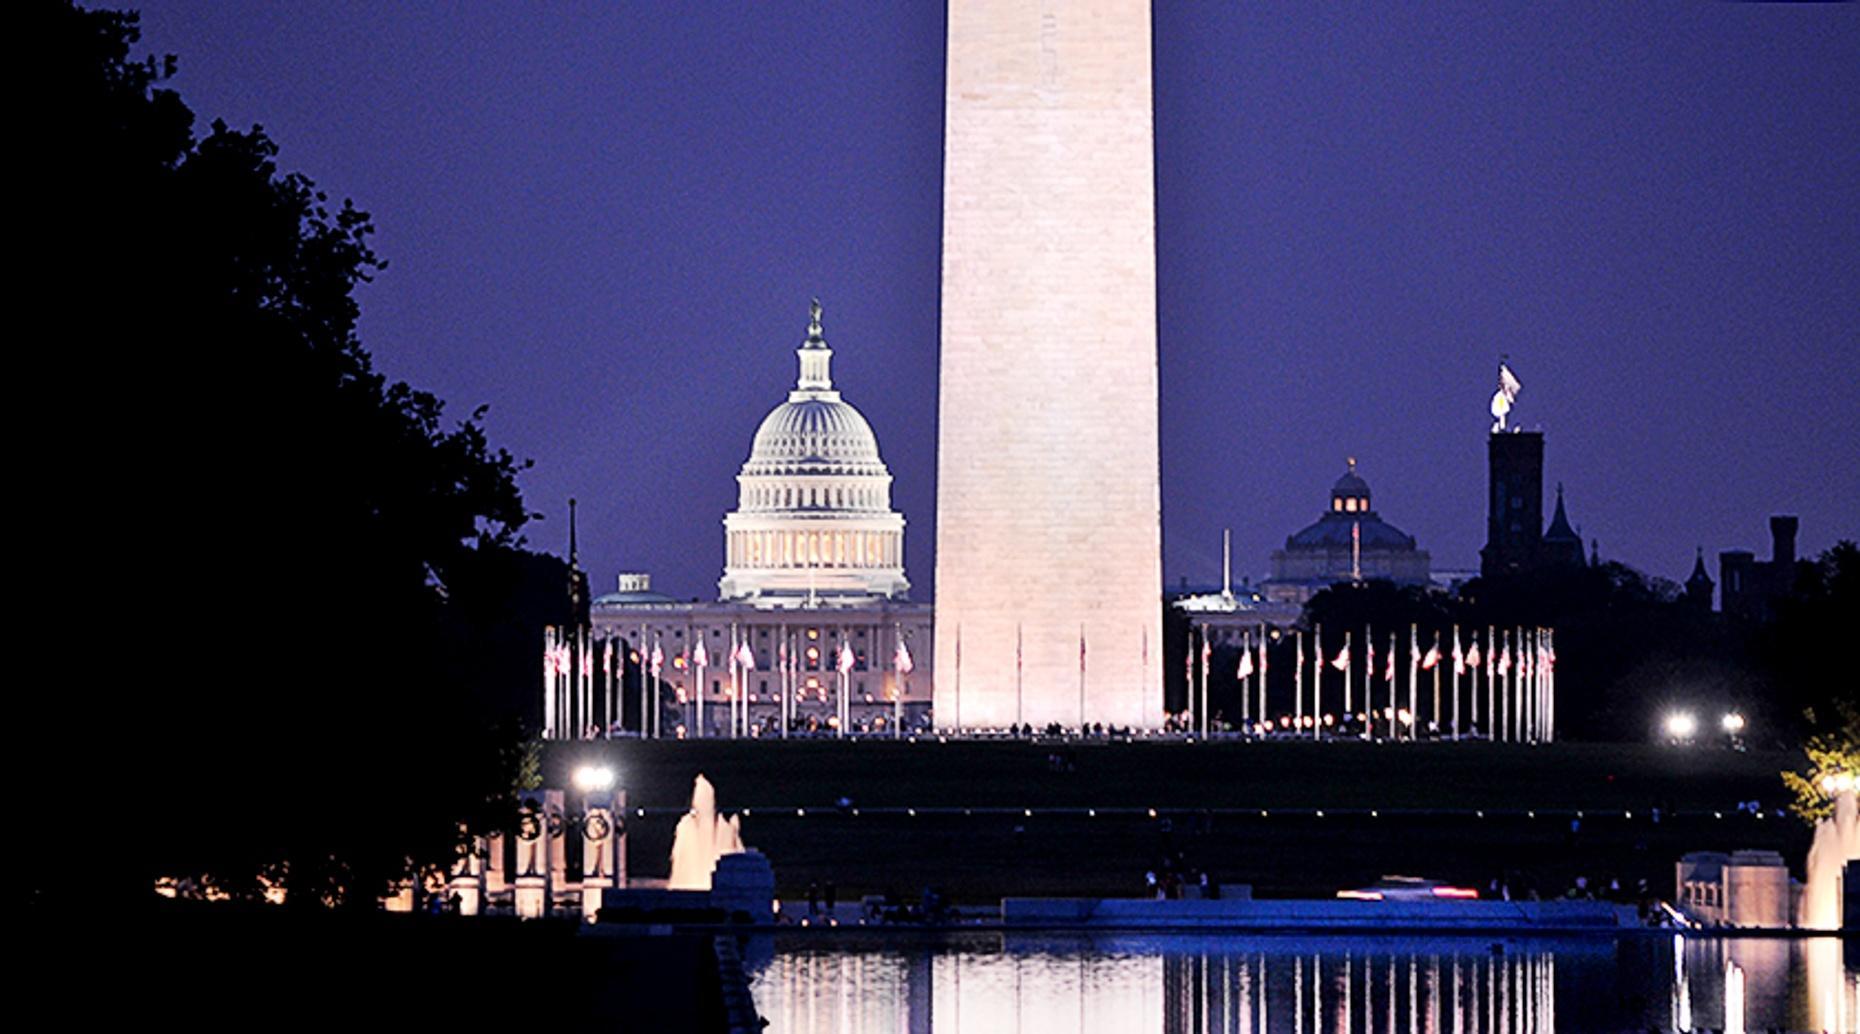 DC Monuments and Memorials Half Day Photo Safari